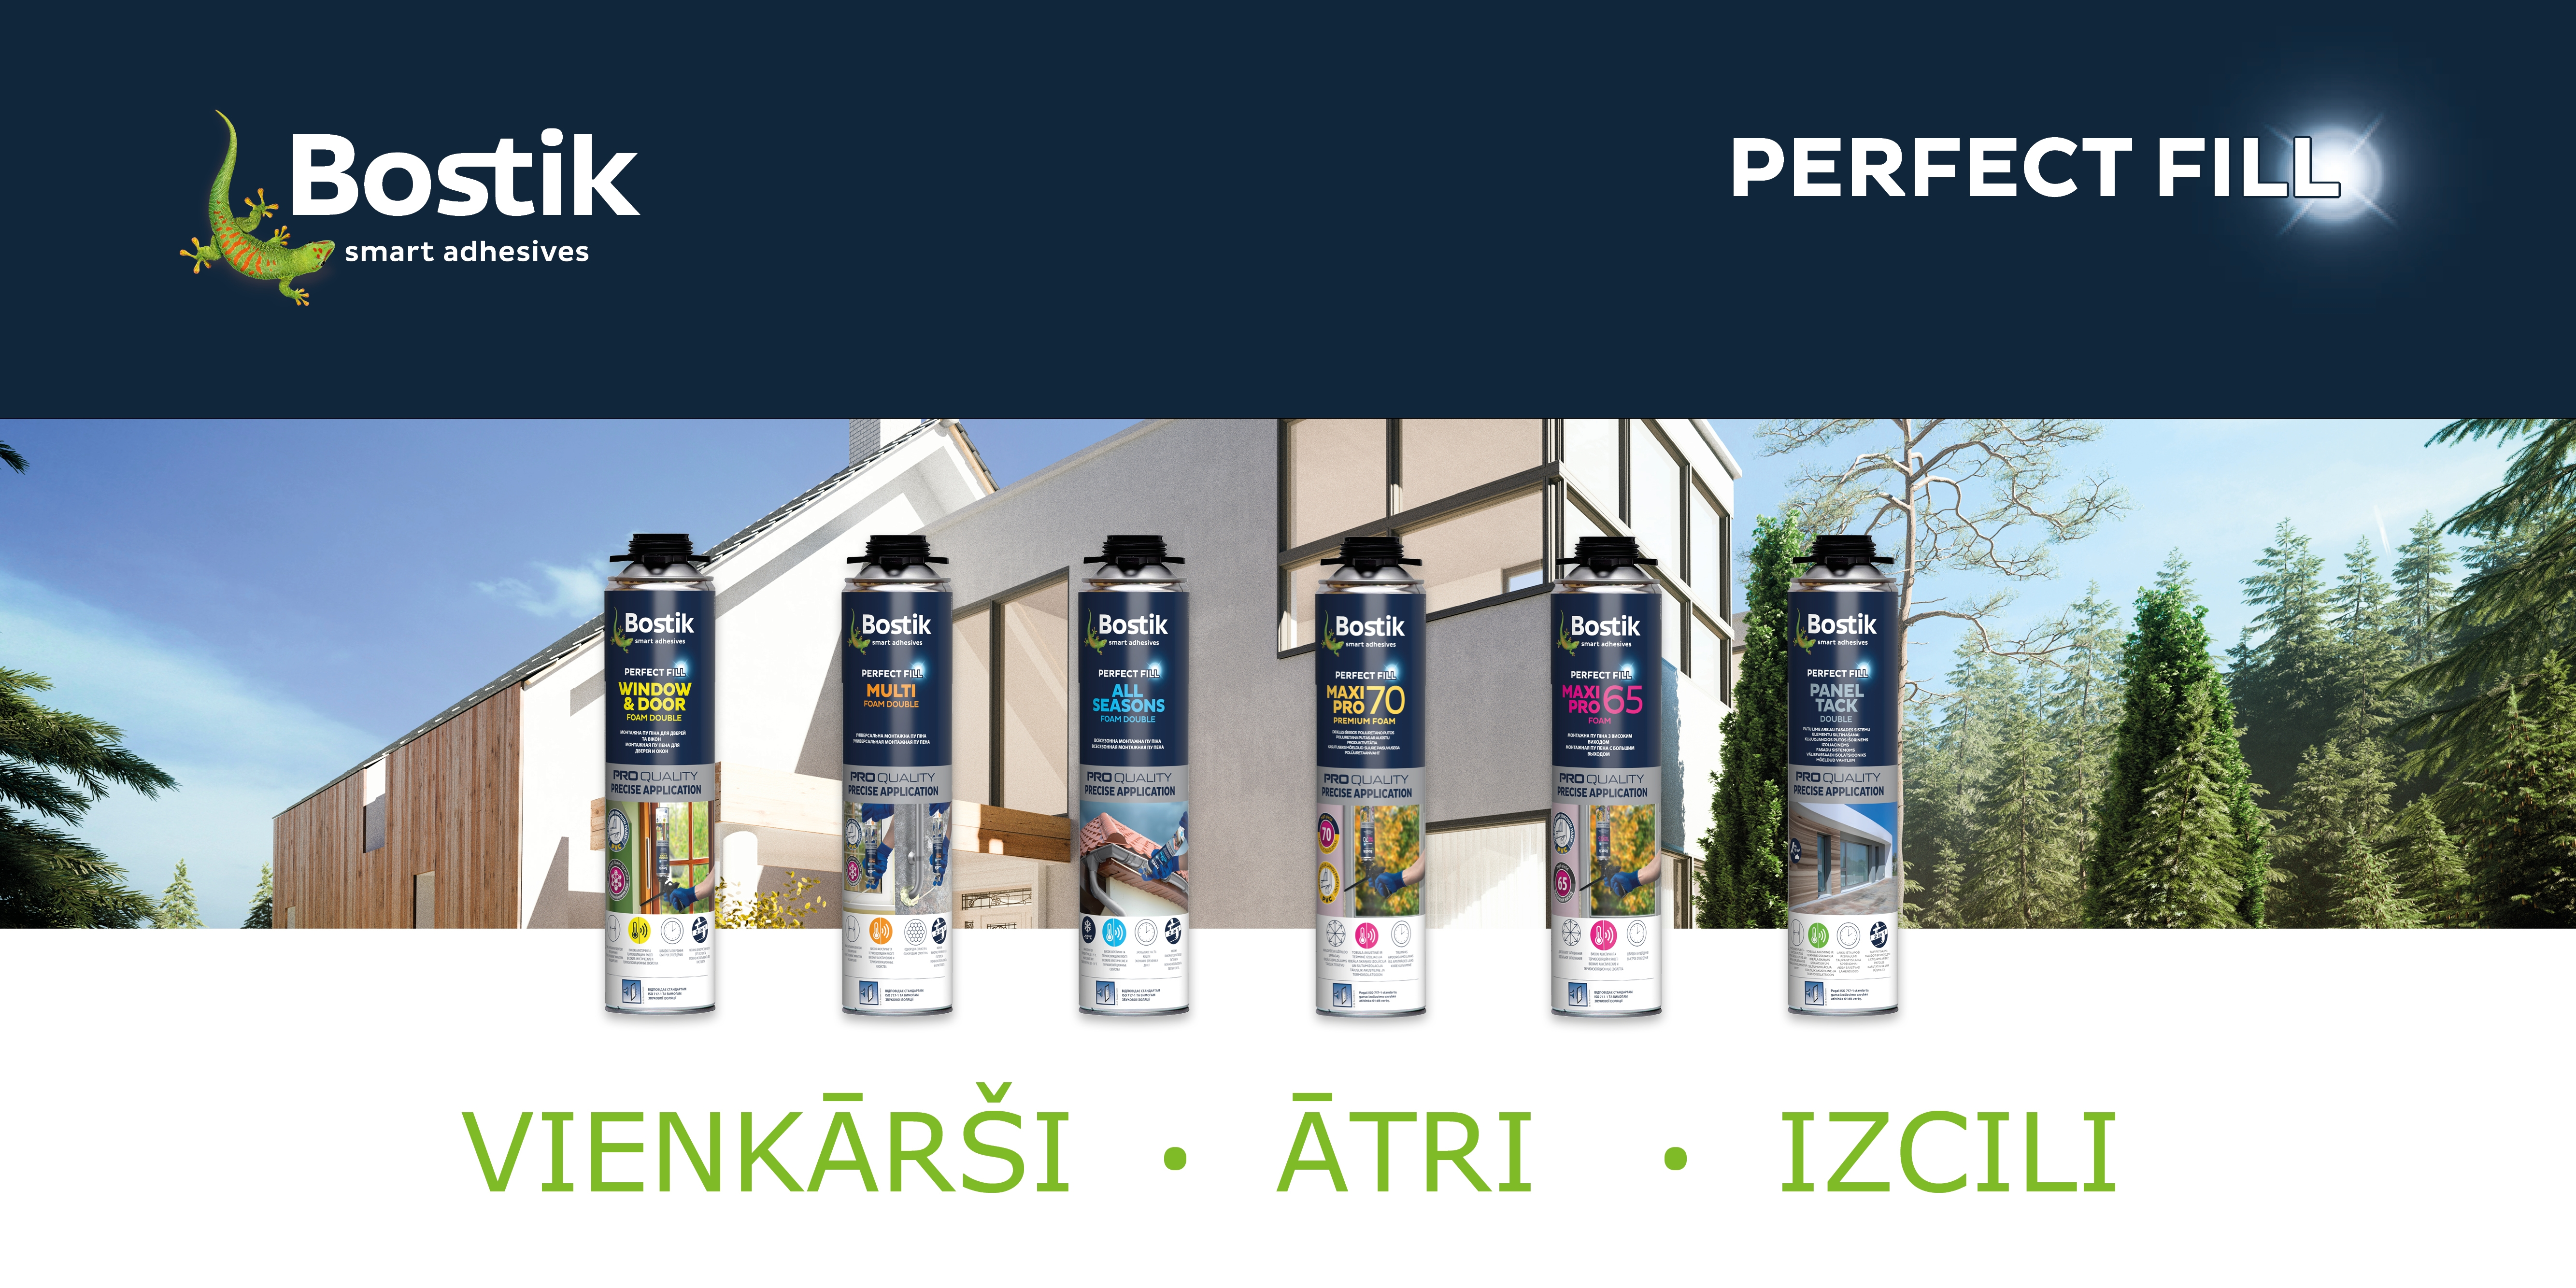 Bostik-DIY-Latvia-Perfect-Fill-banner-1280x640